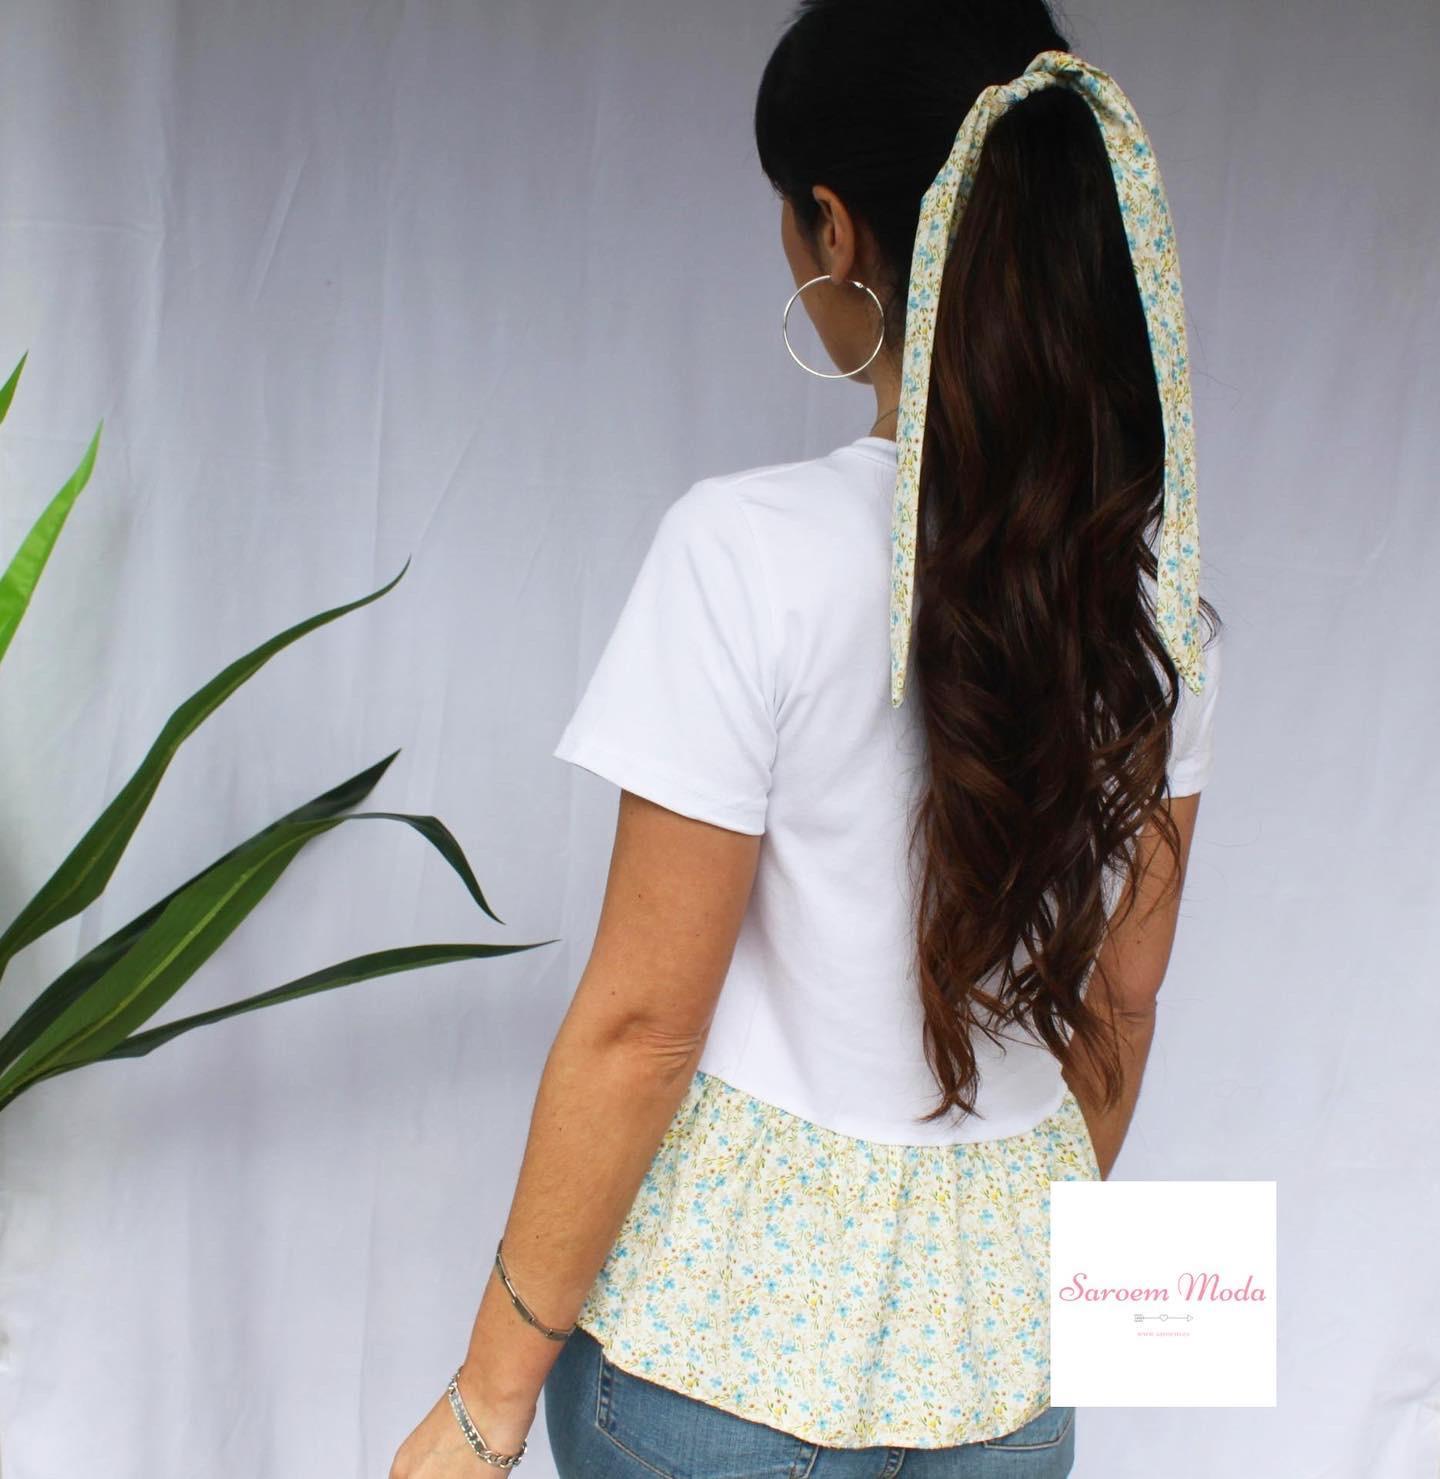 Camiseta + Lazo Flores